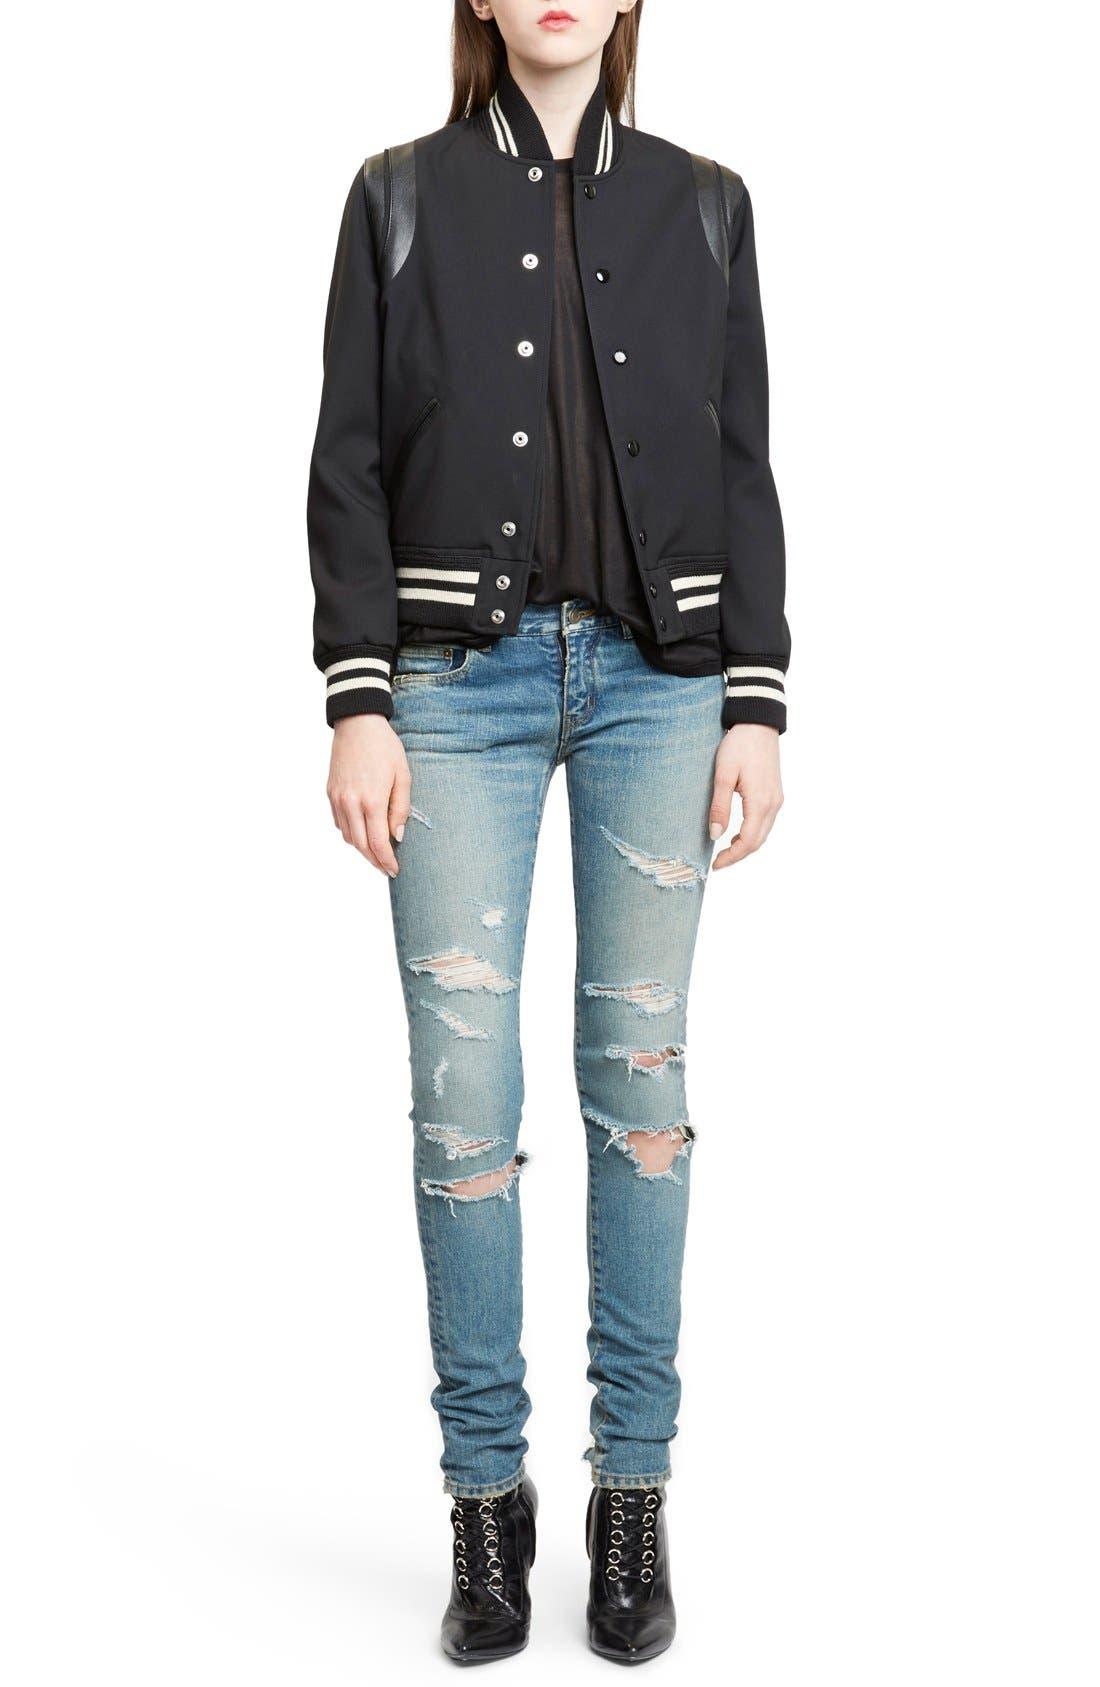 Main Image - Saint Laurent 'Teddy' Black Leather Trim Bomber Jacket